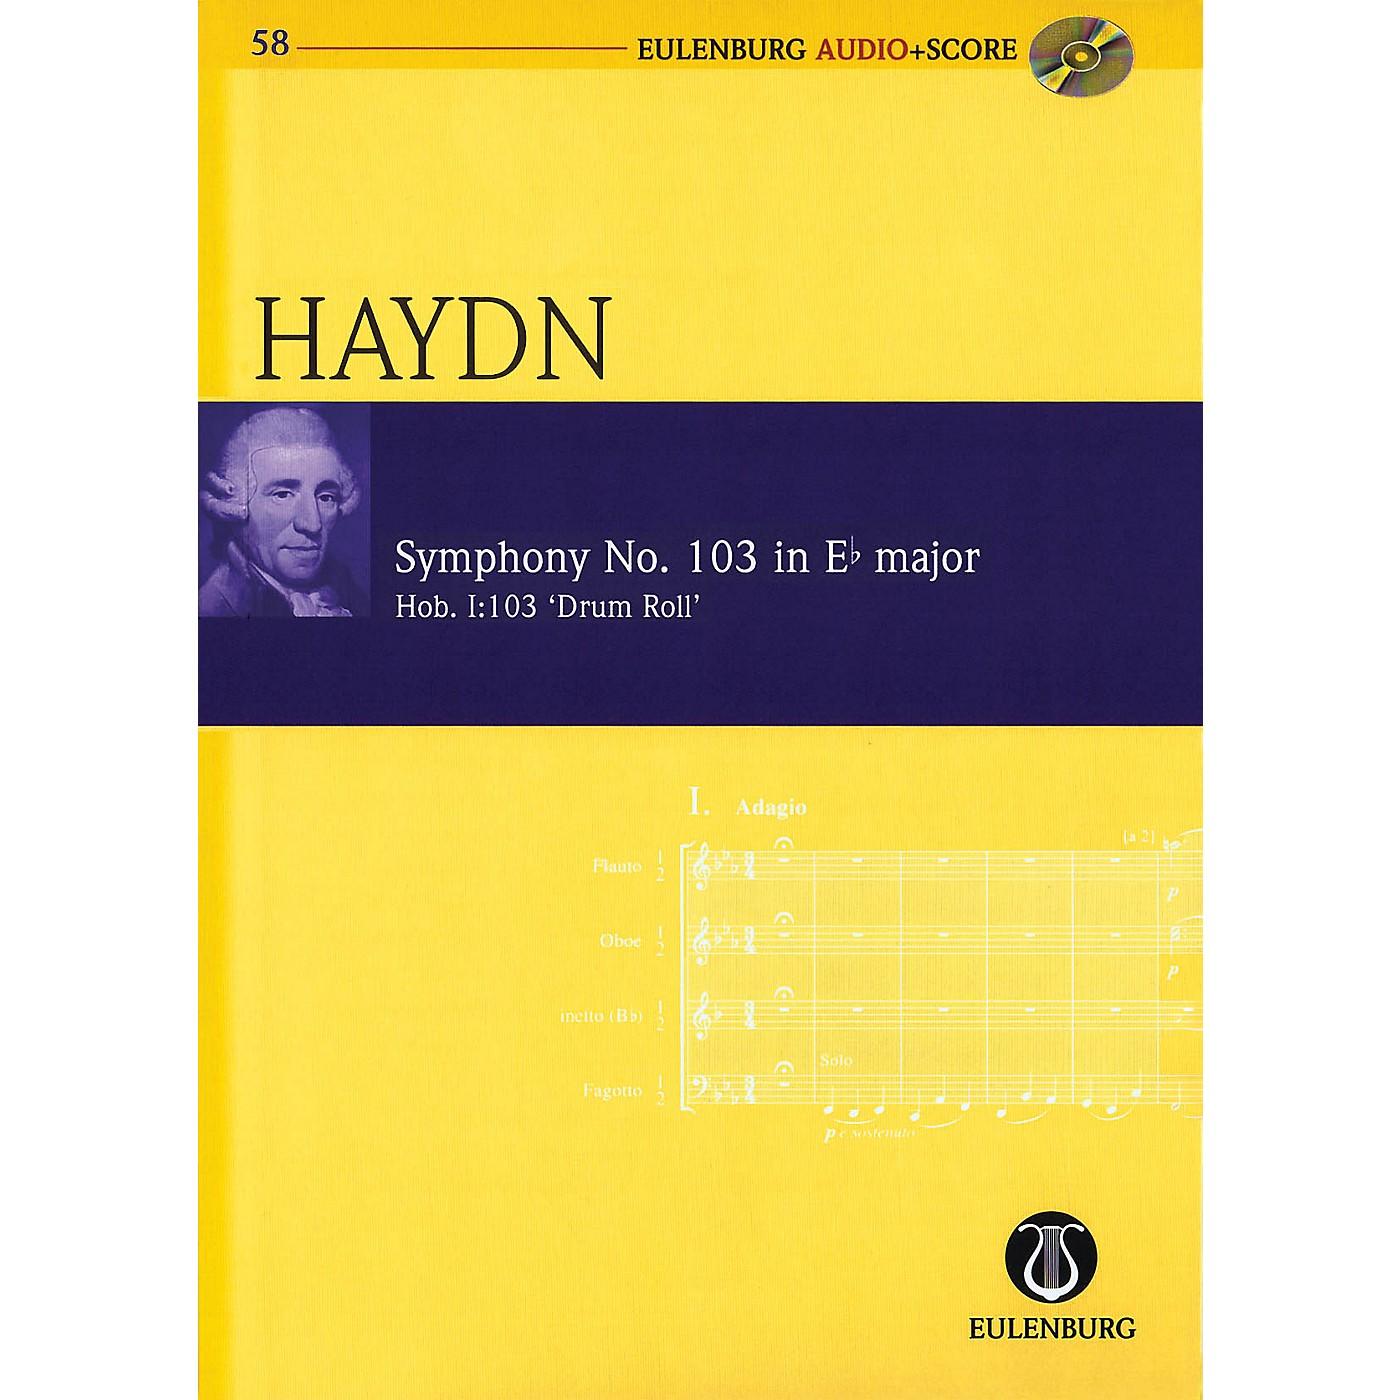 Eulenburg Symphony No. 103 in E-flat Maj Hob I:103 Drum Roll Eulenberg Audio plus Score W/ CD by Haydn thumbnail